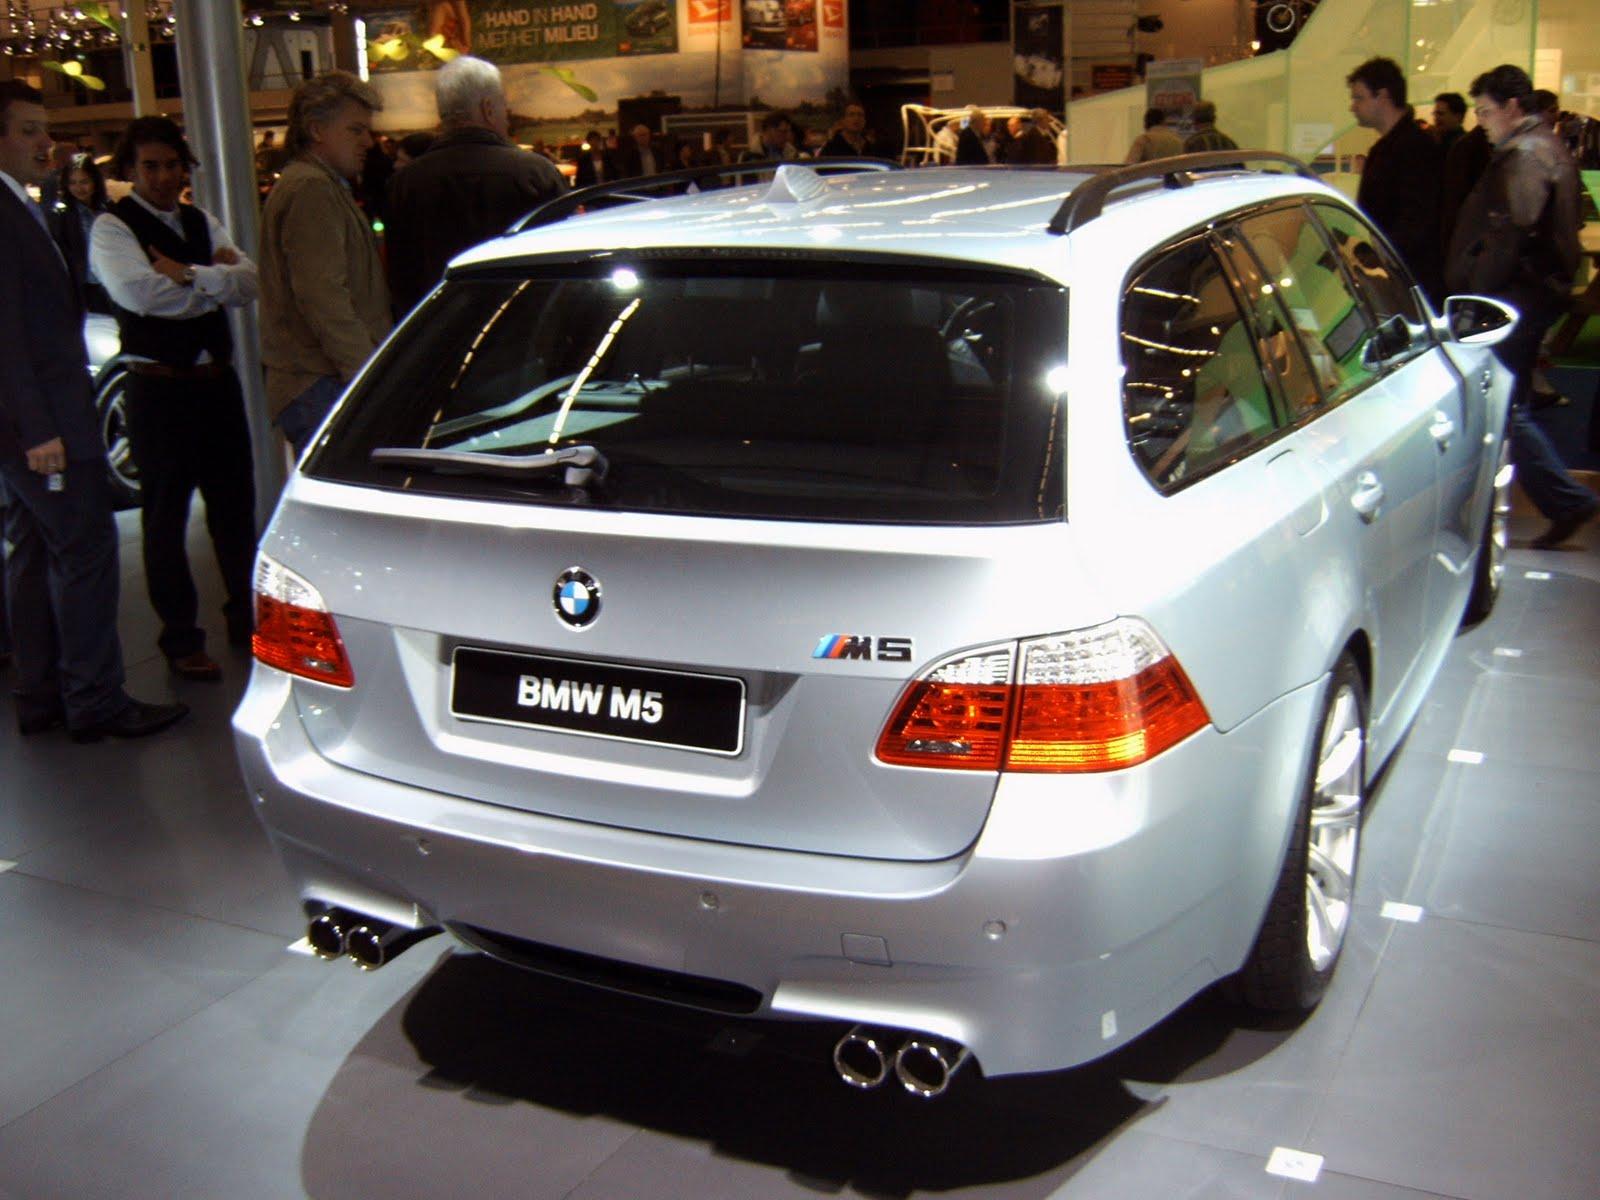 Guitigefilmpjes: Picture update: BMW 5-series E60 LCI (part 2)